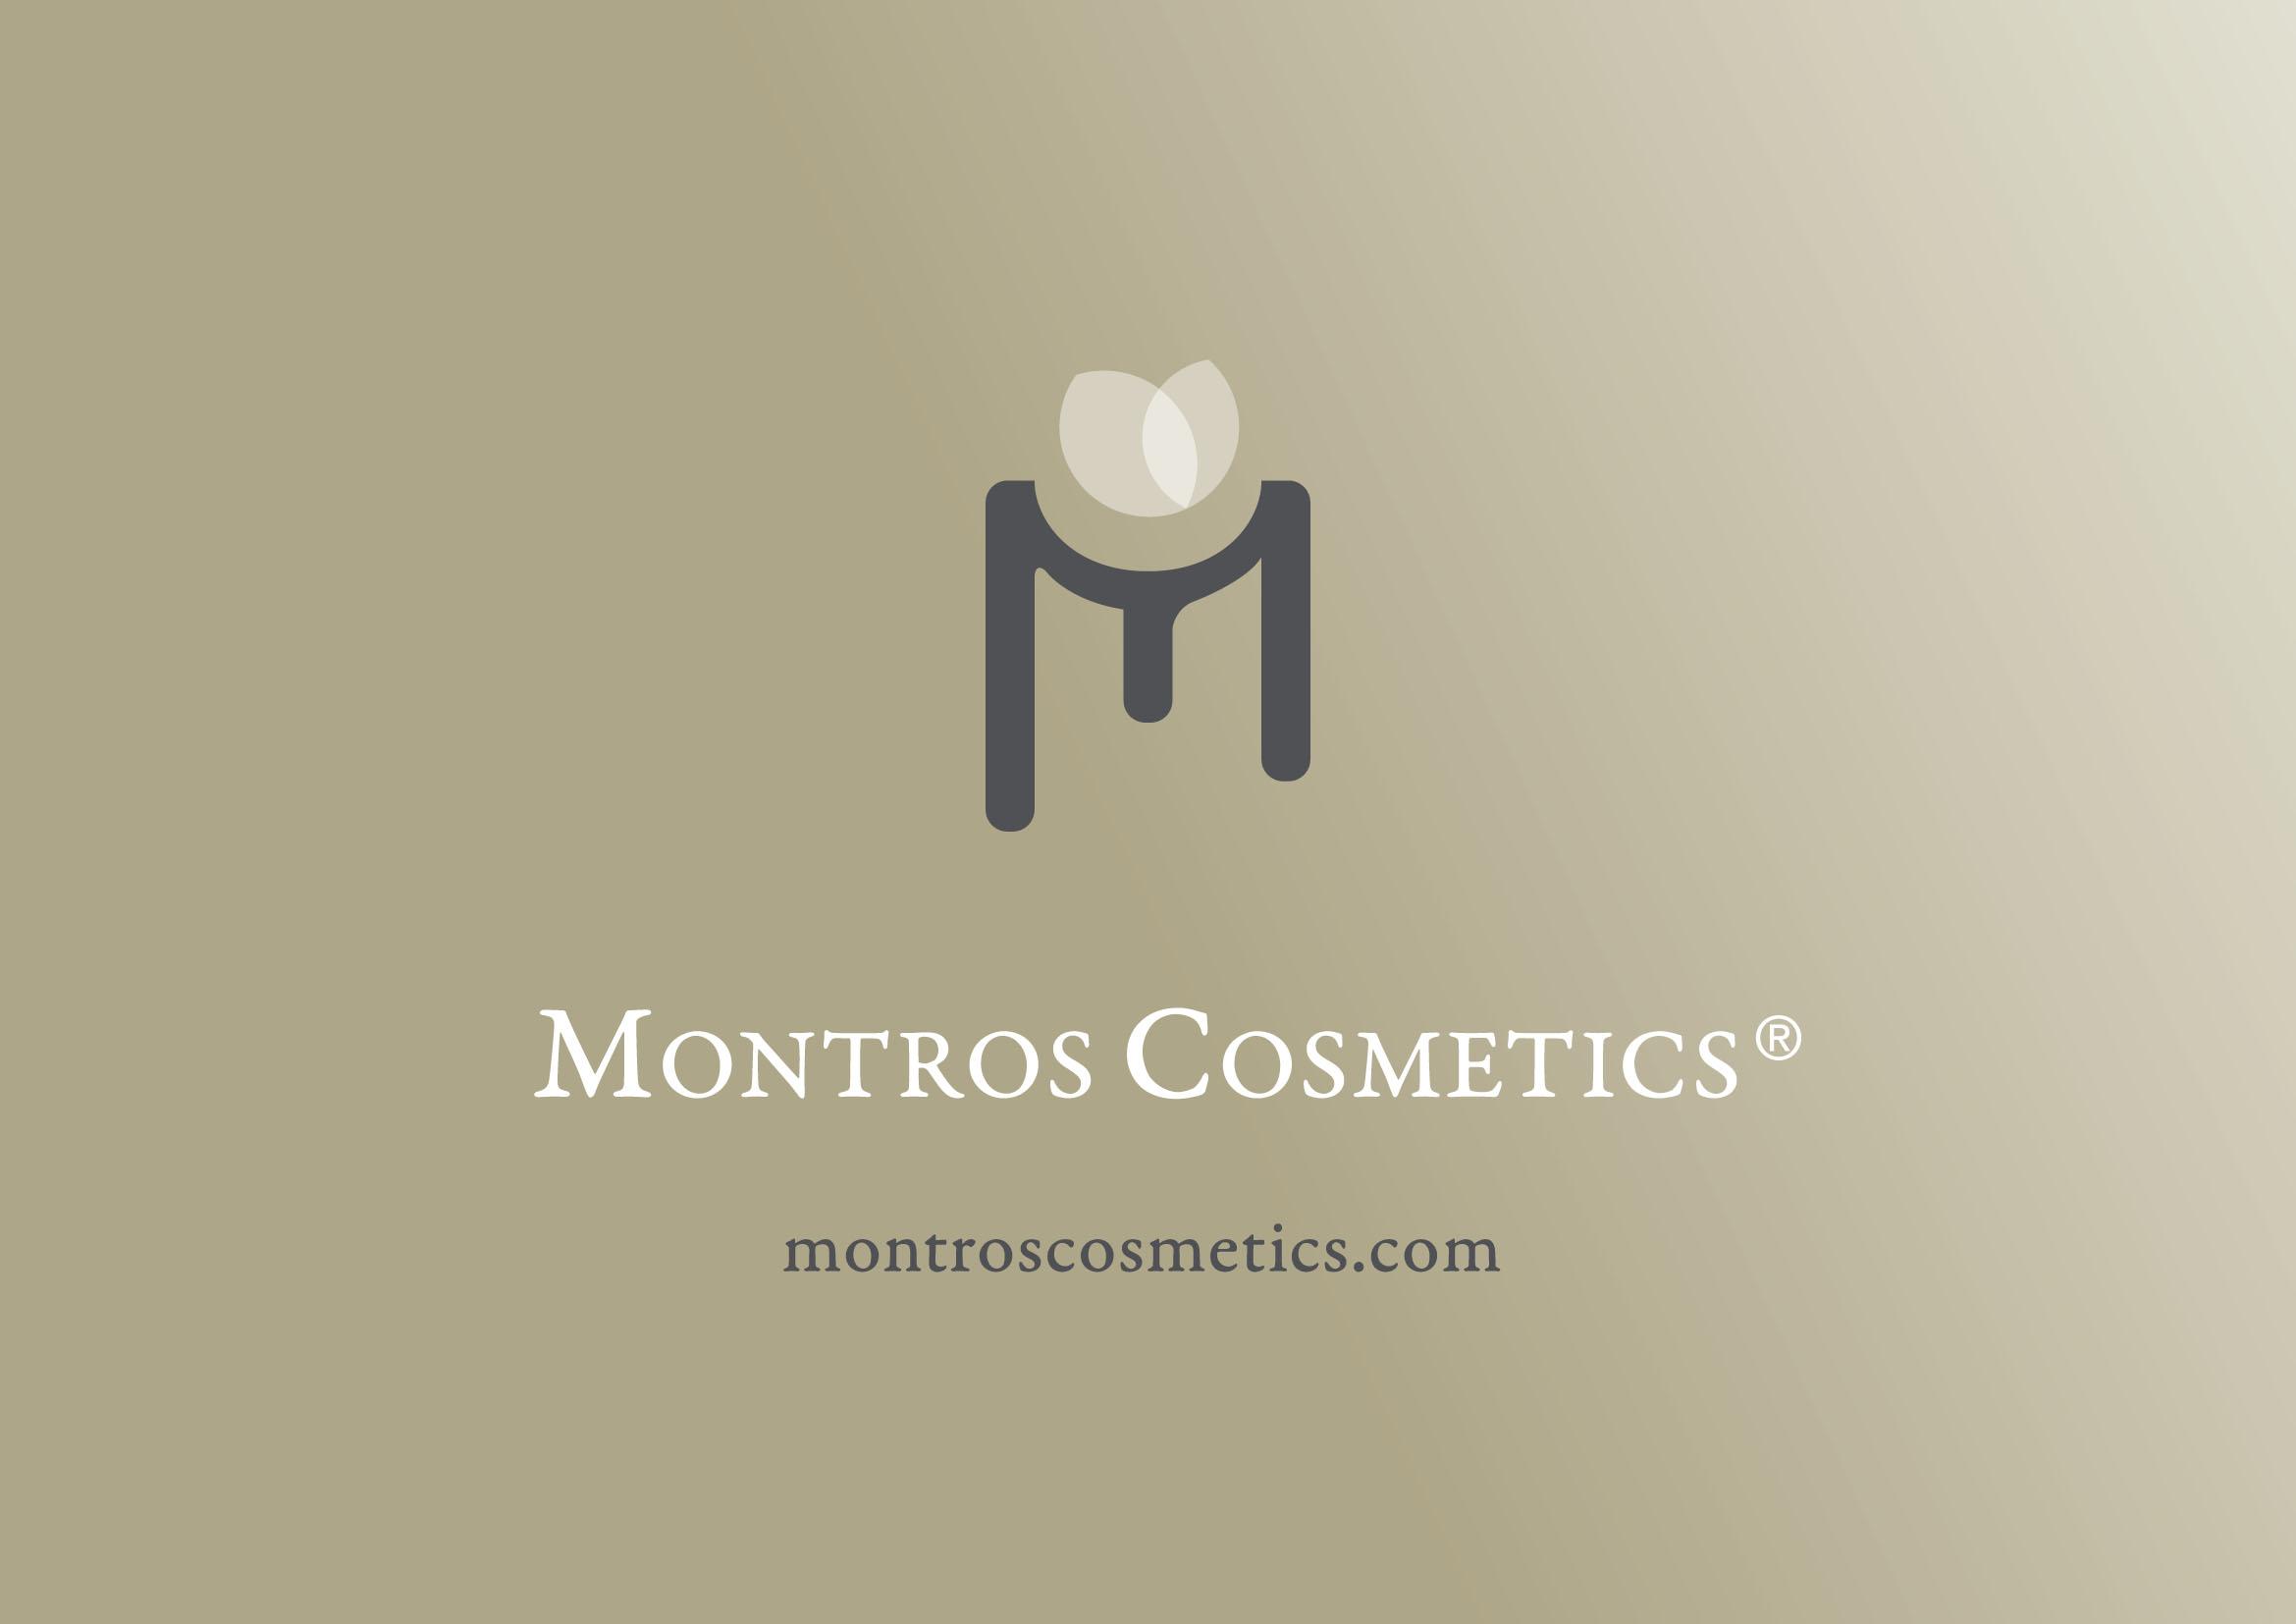 Montros Cosmetics. jpg.jpg